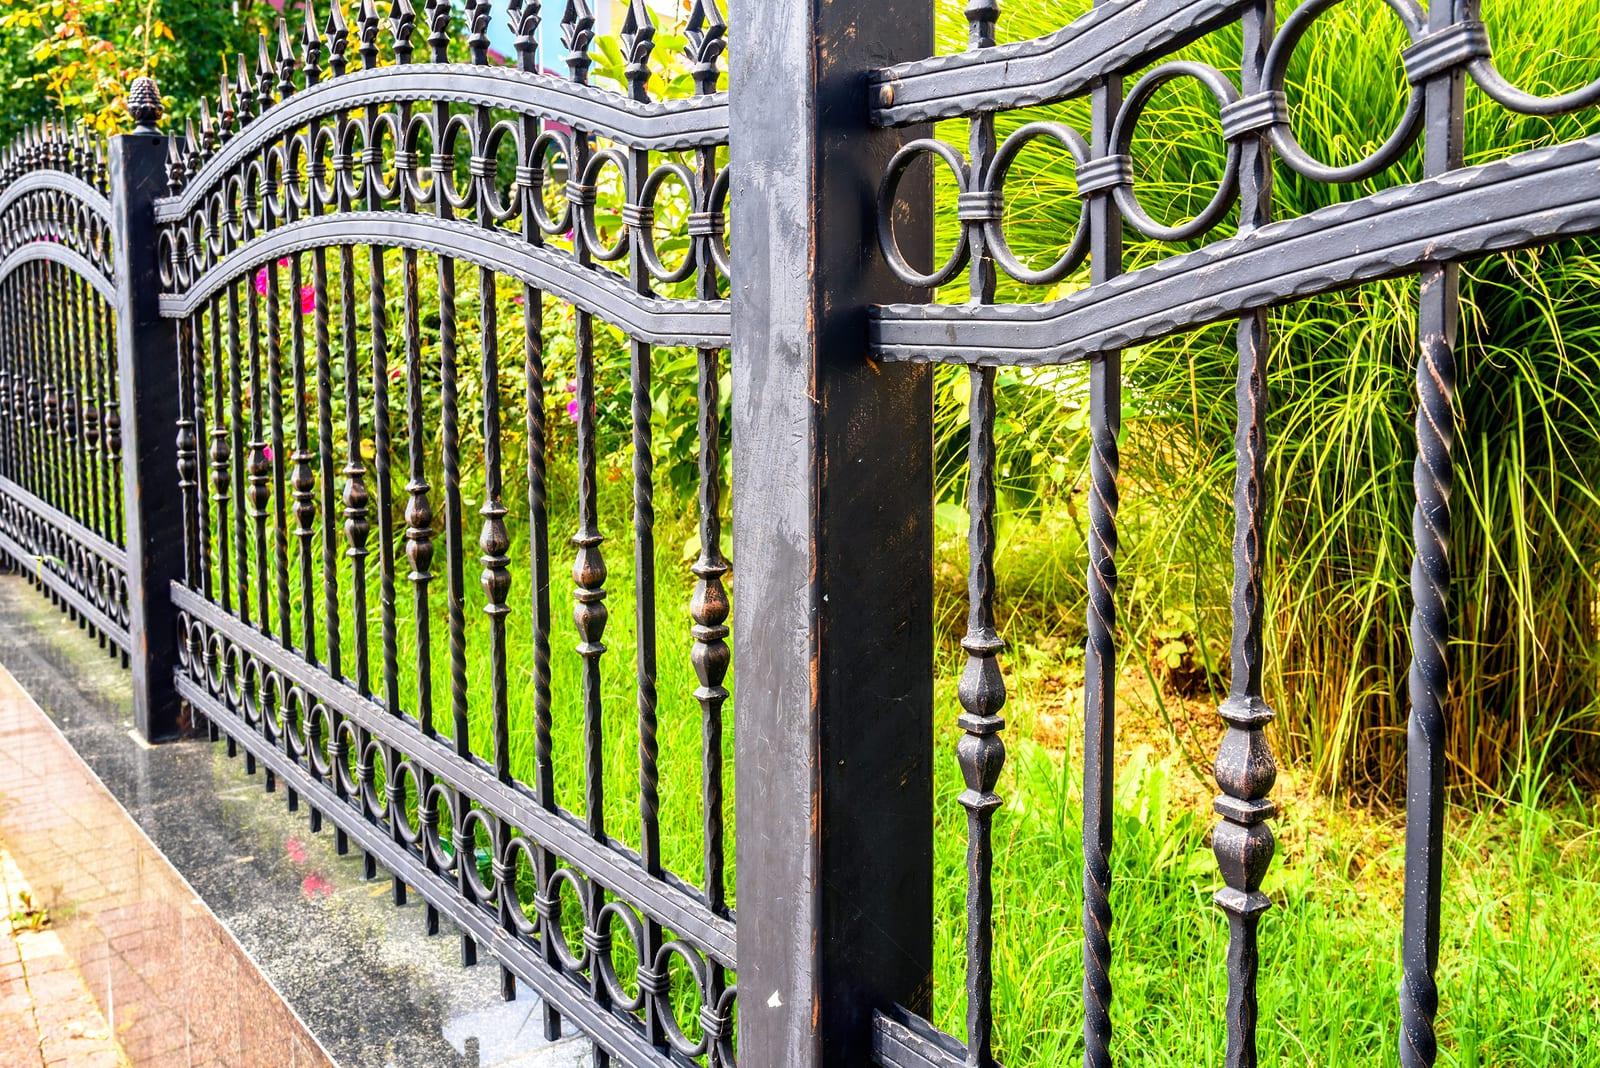 bigstock Wrought Iron Fence Black Meta 258218020